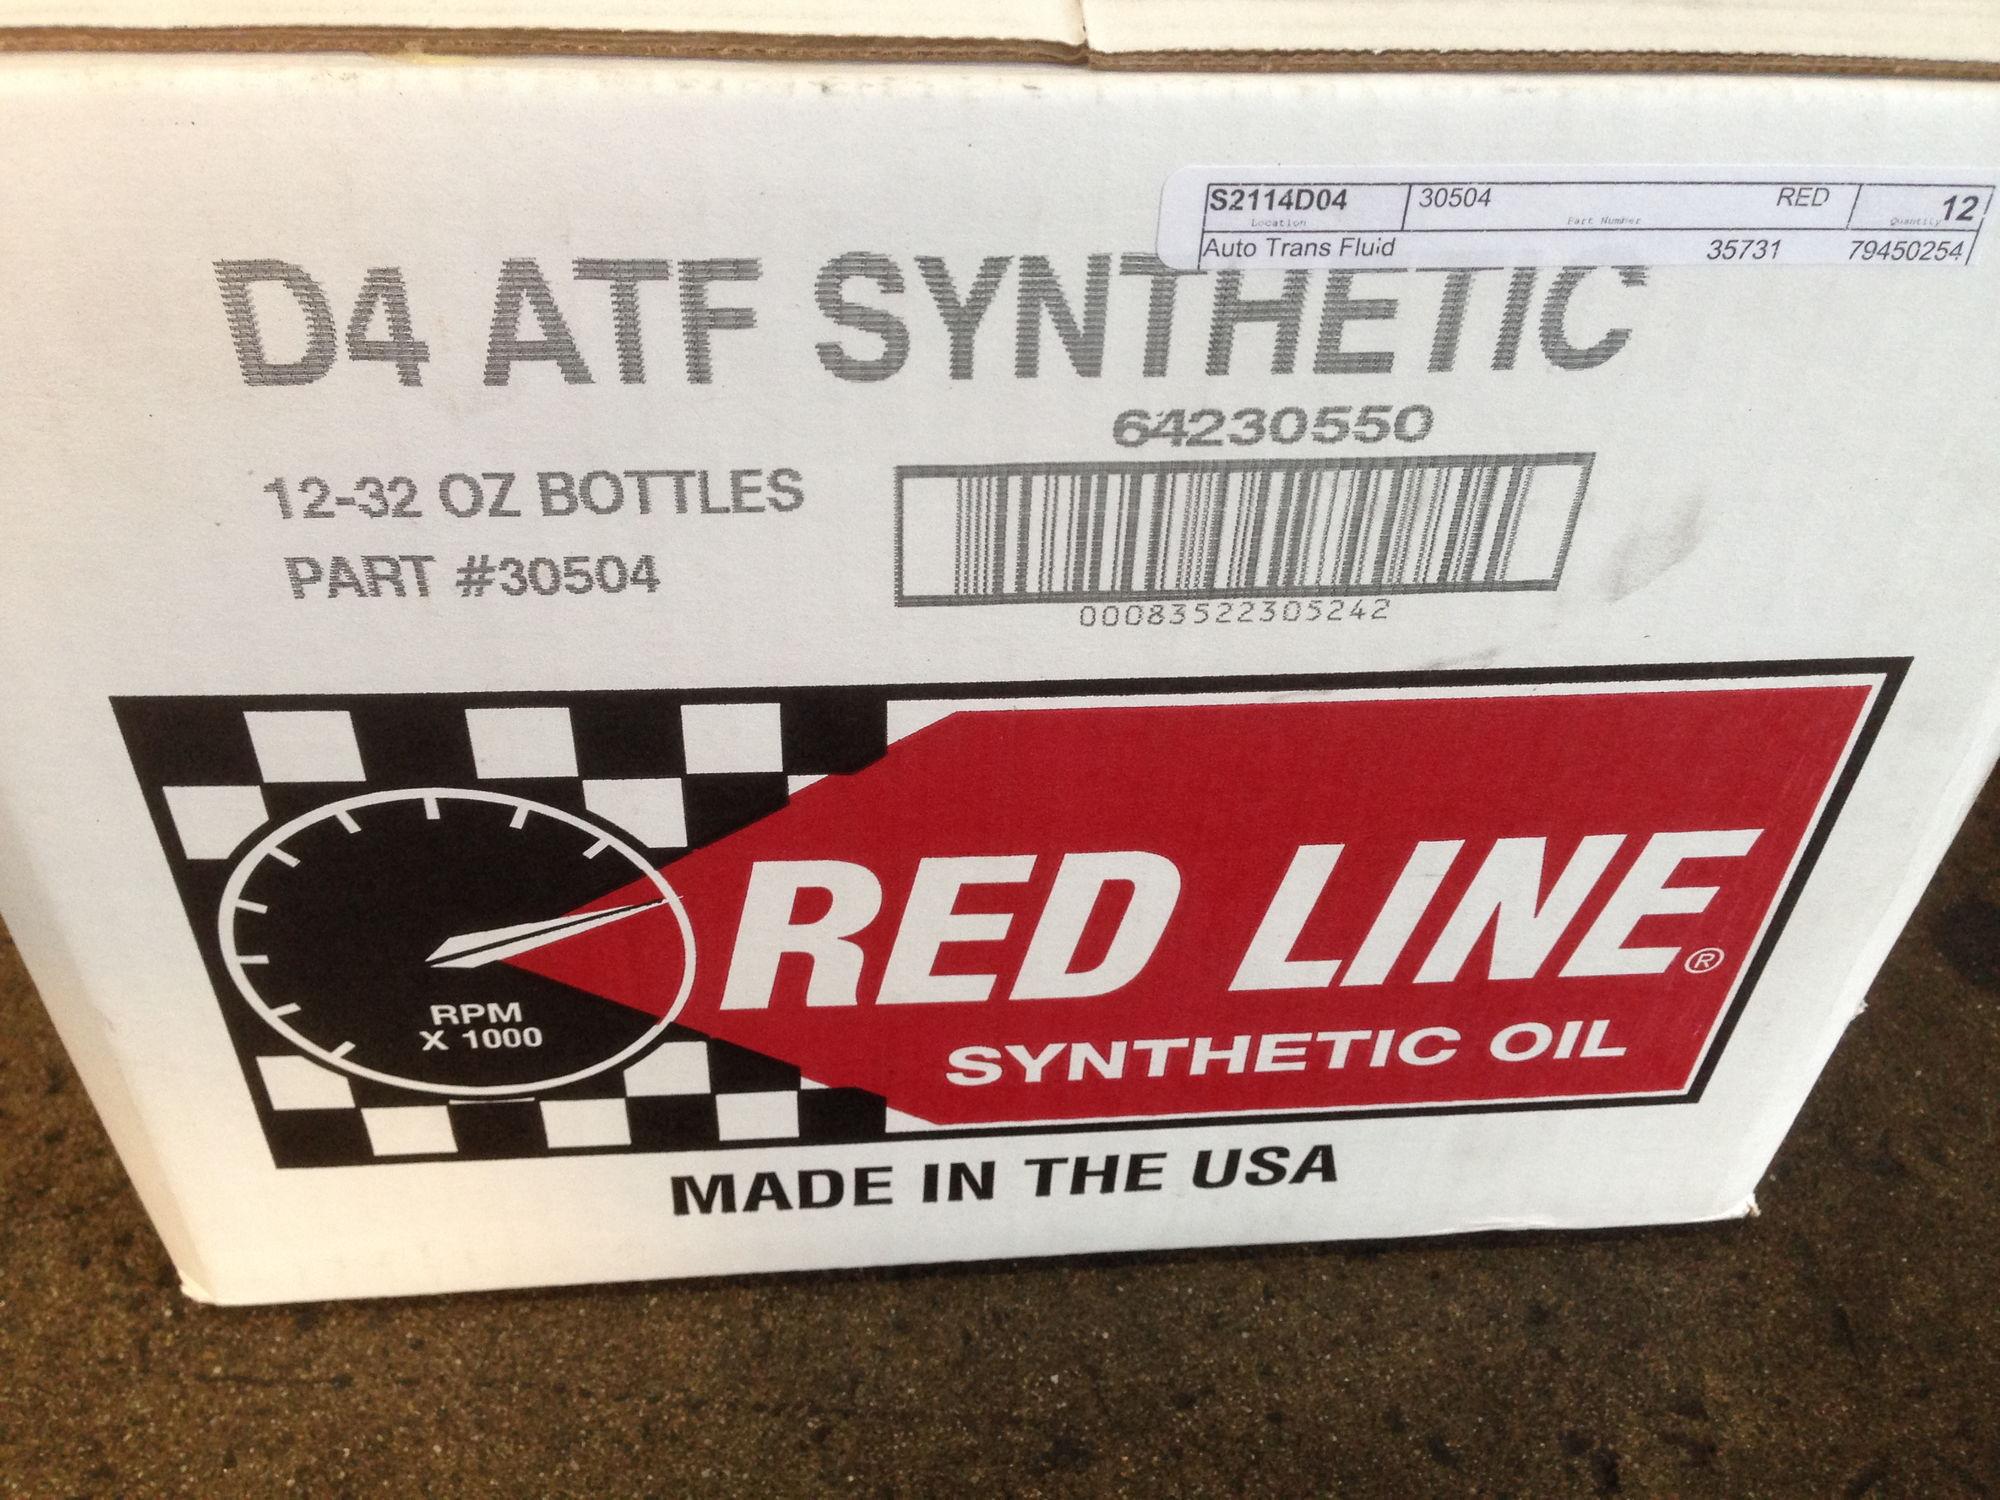 Transmission red line d4 8 quarts meyle filter from autohausaz com front differential red line 75w 90 transfer case fuchs titan atf 5005 1 quart